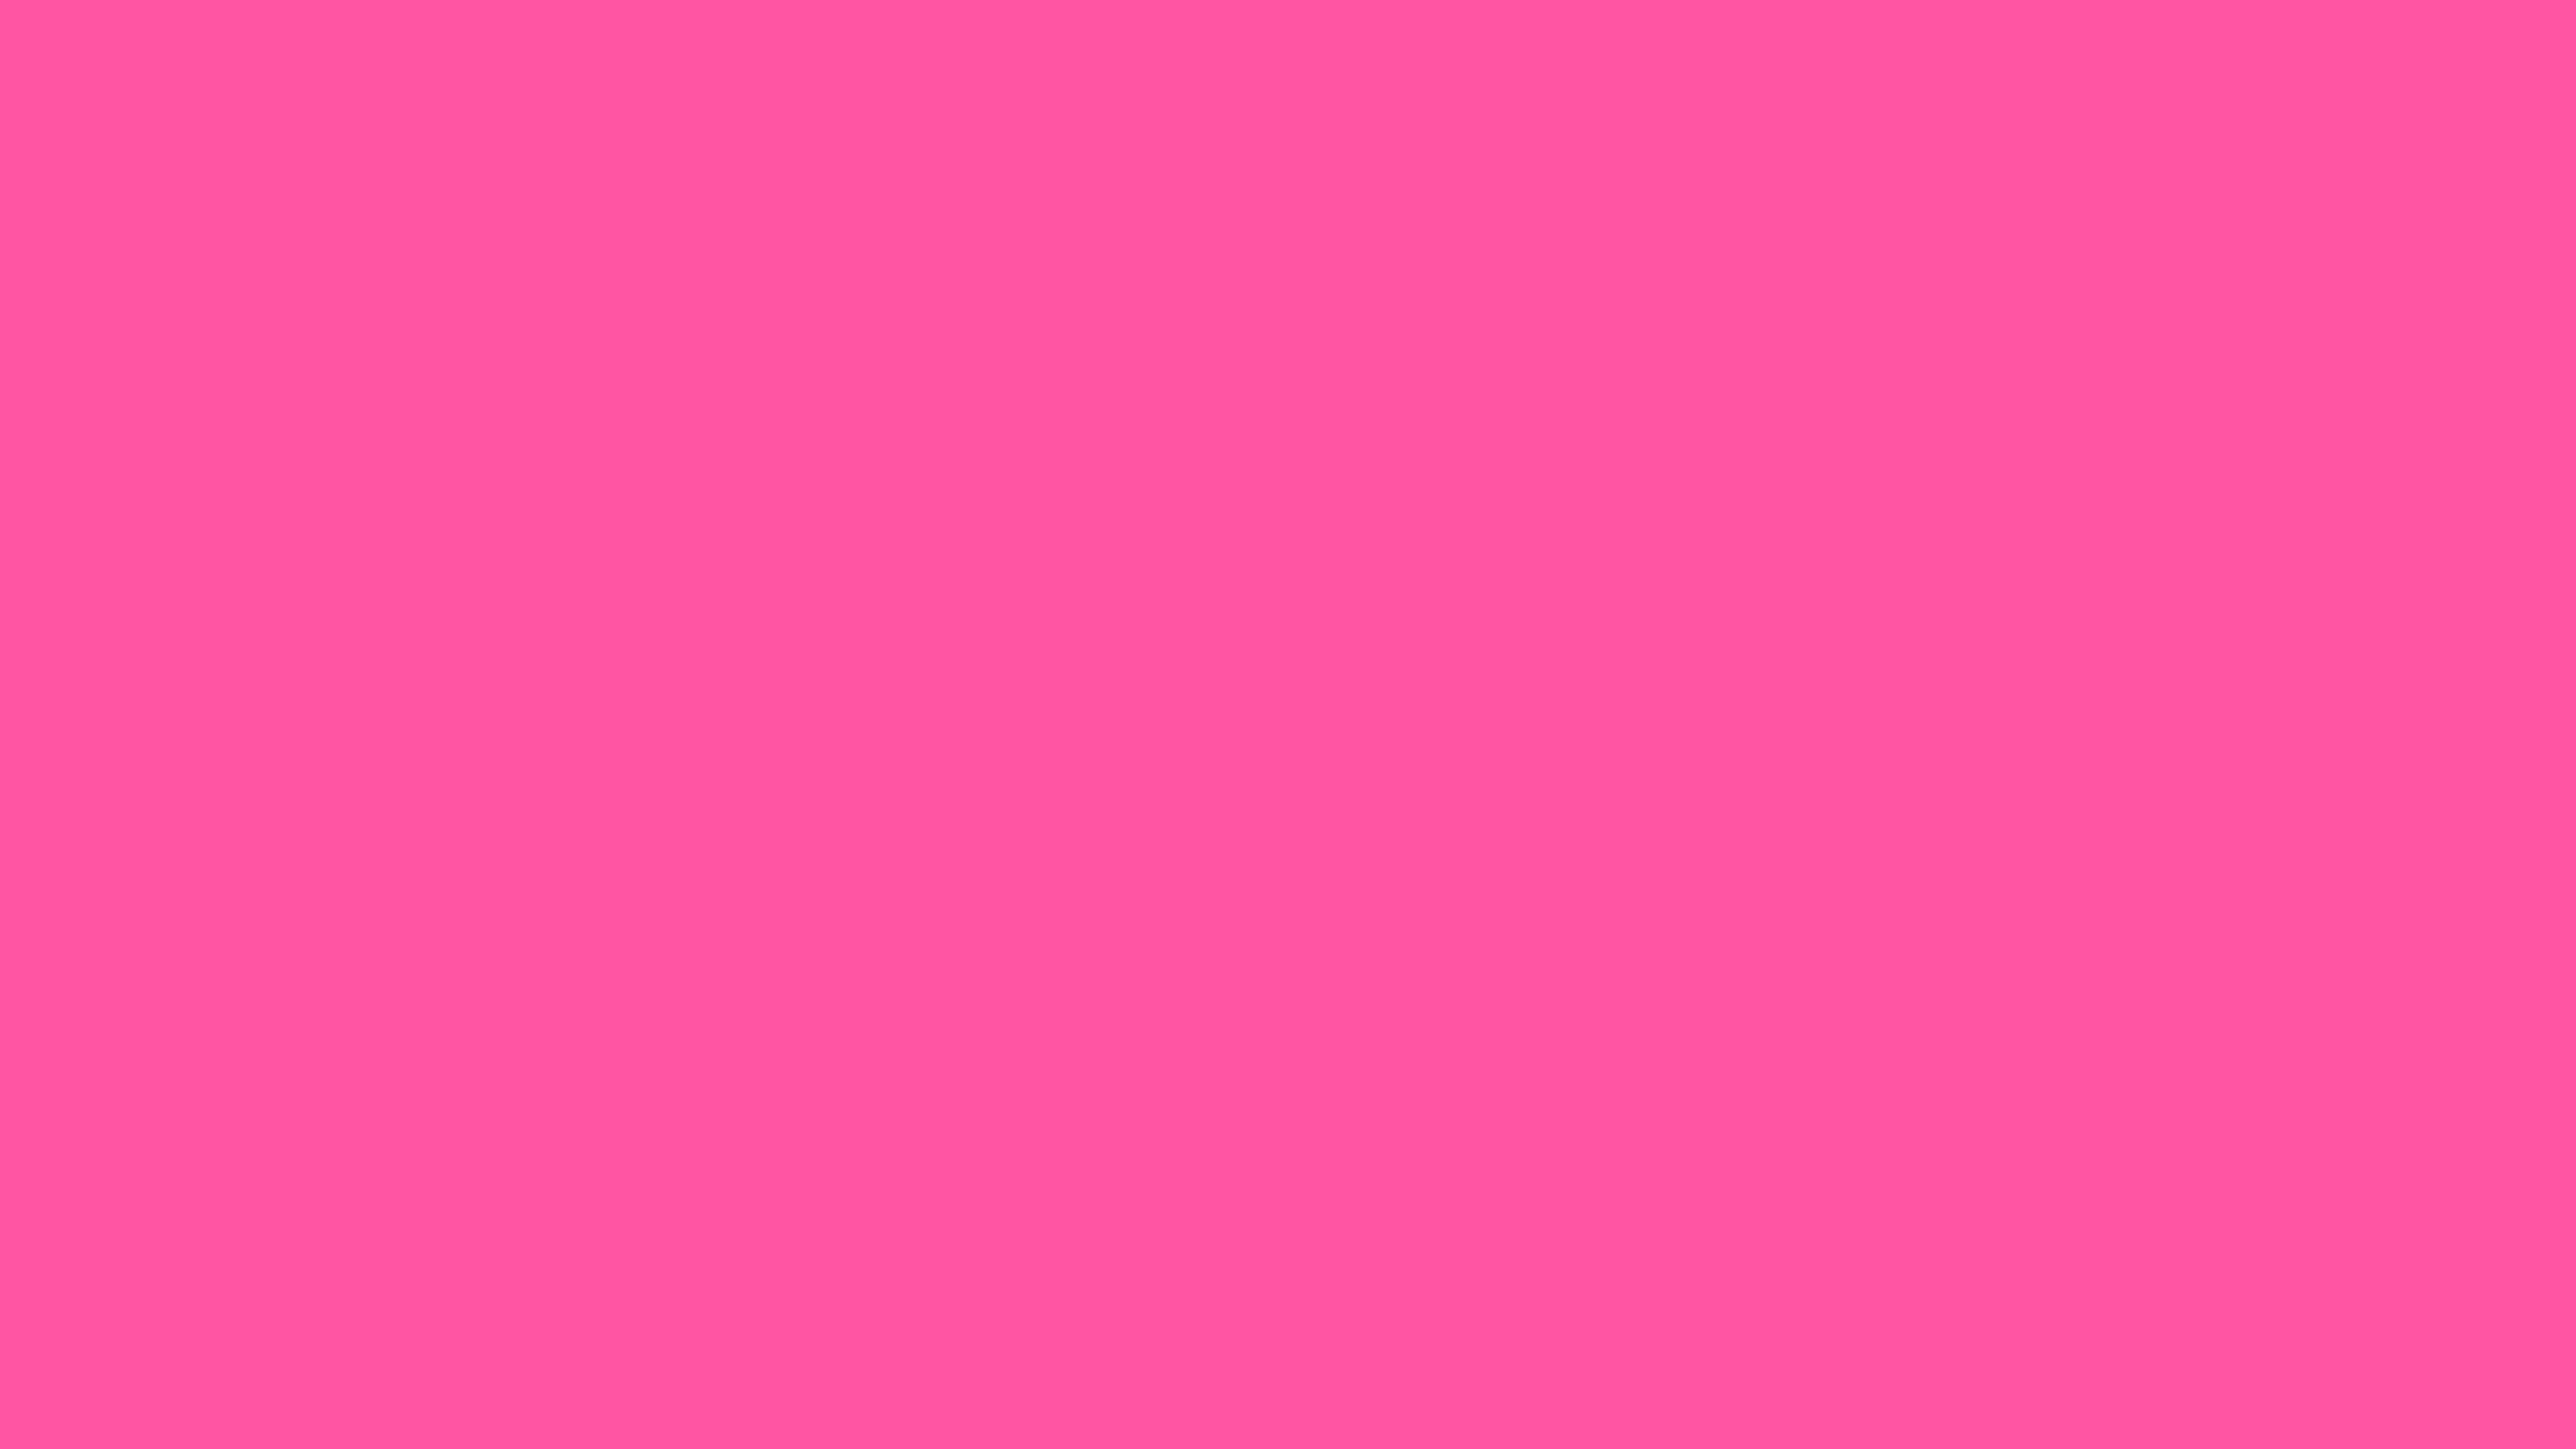 4096x2304 Brilliant Rose Solid Color Background